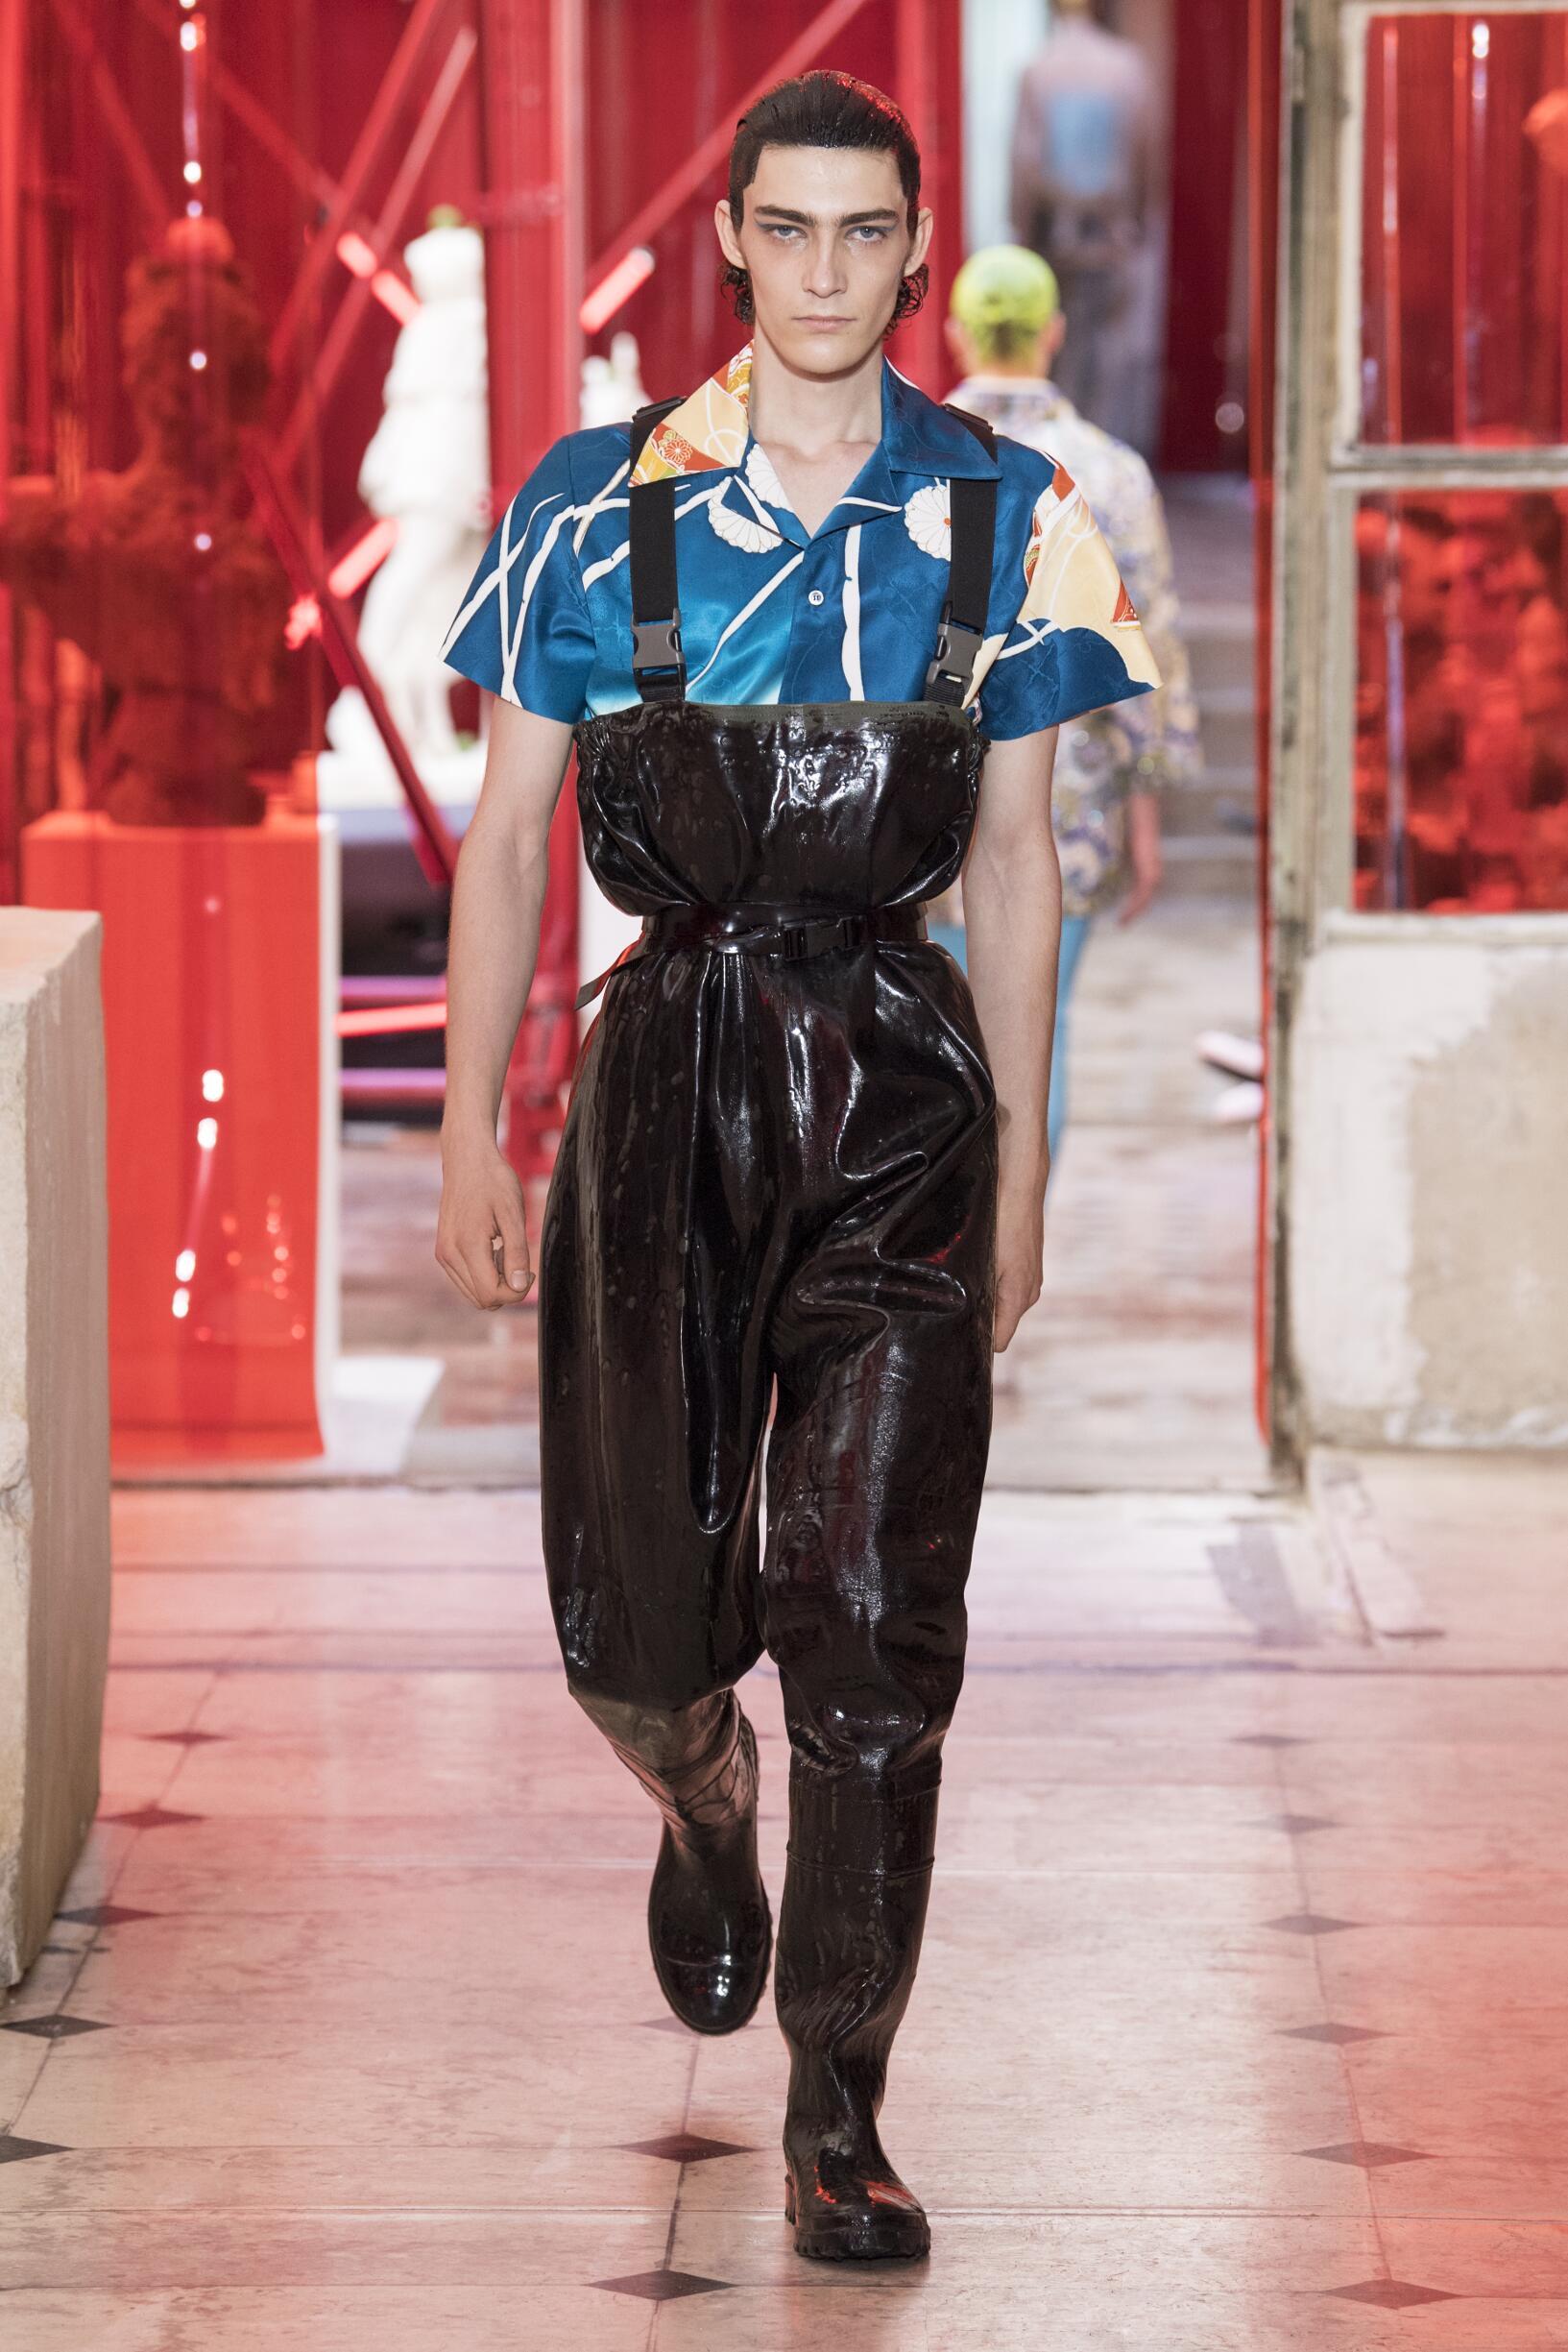 Fashion 2019 Catwalk Maison Margiela Summer Man Collection